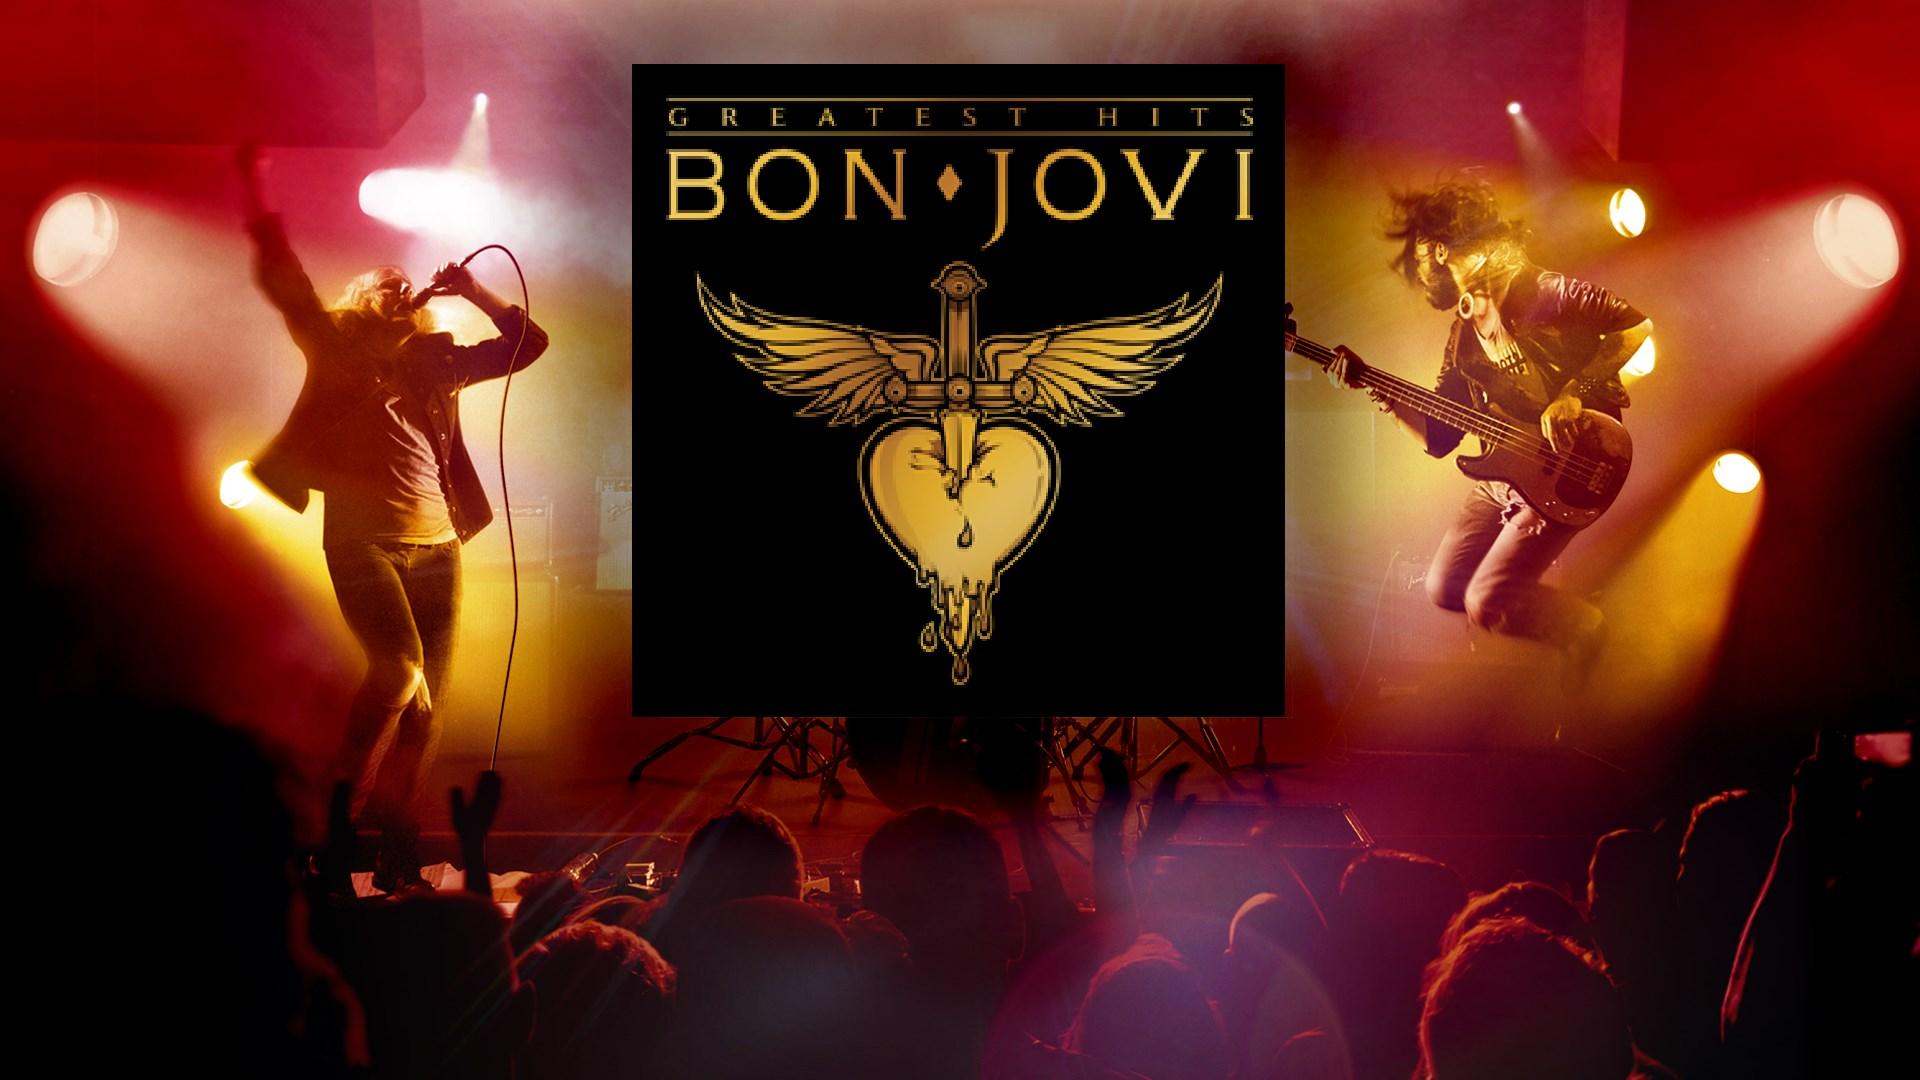 """It's My Life"" - Bon Jovi"